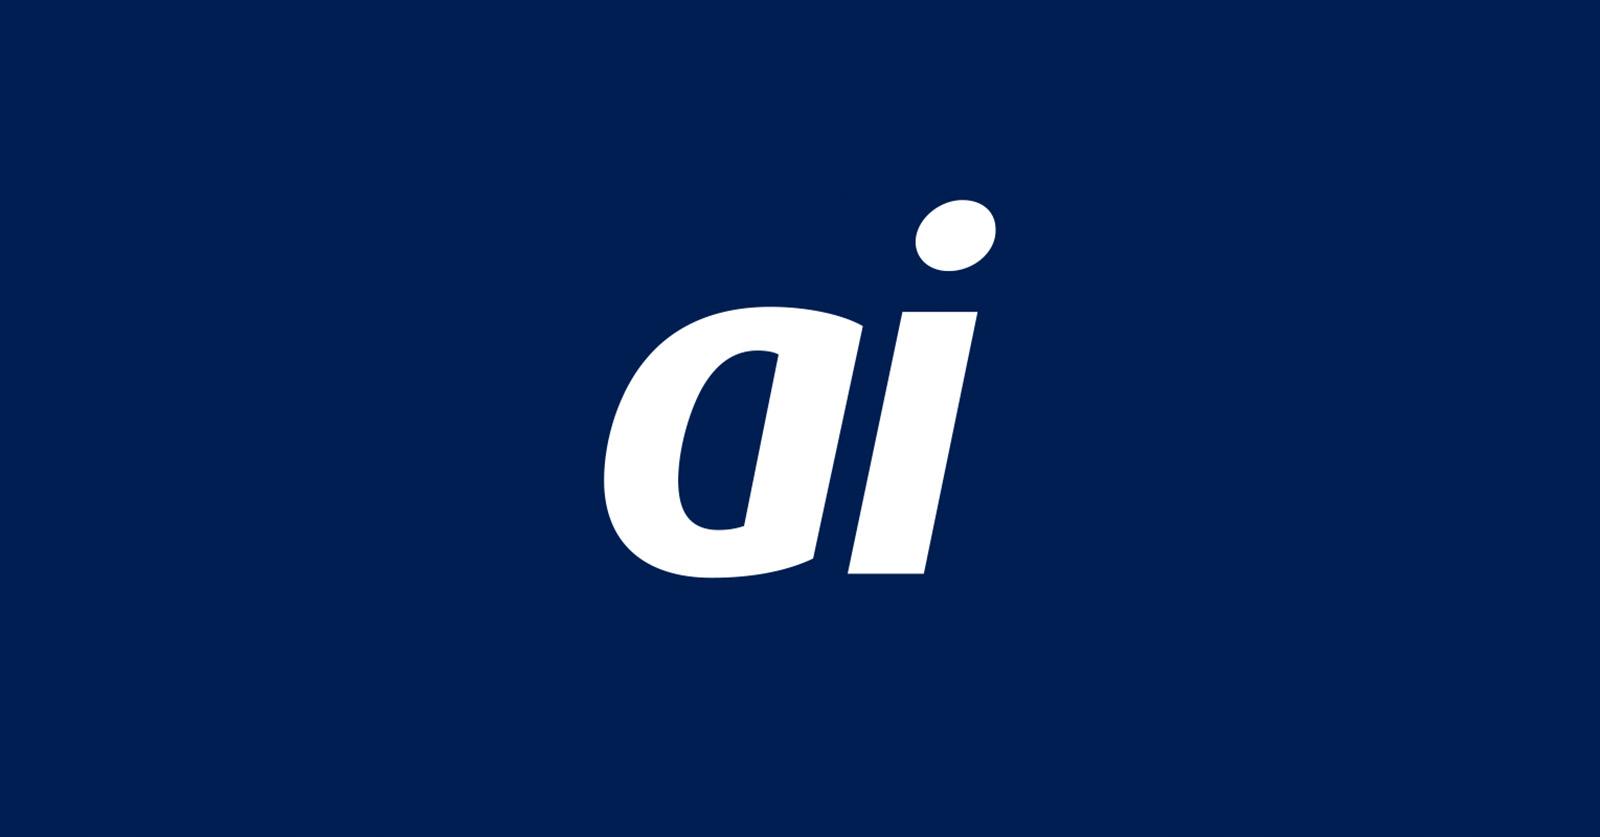 https://andaluciainformacion.es/ -